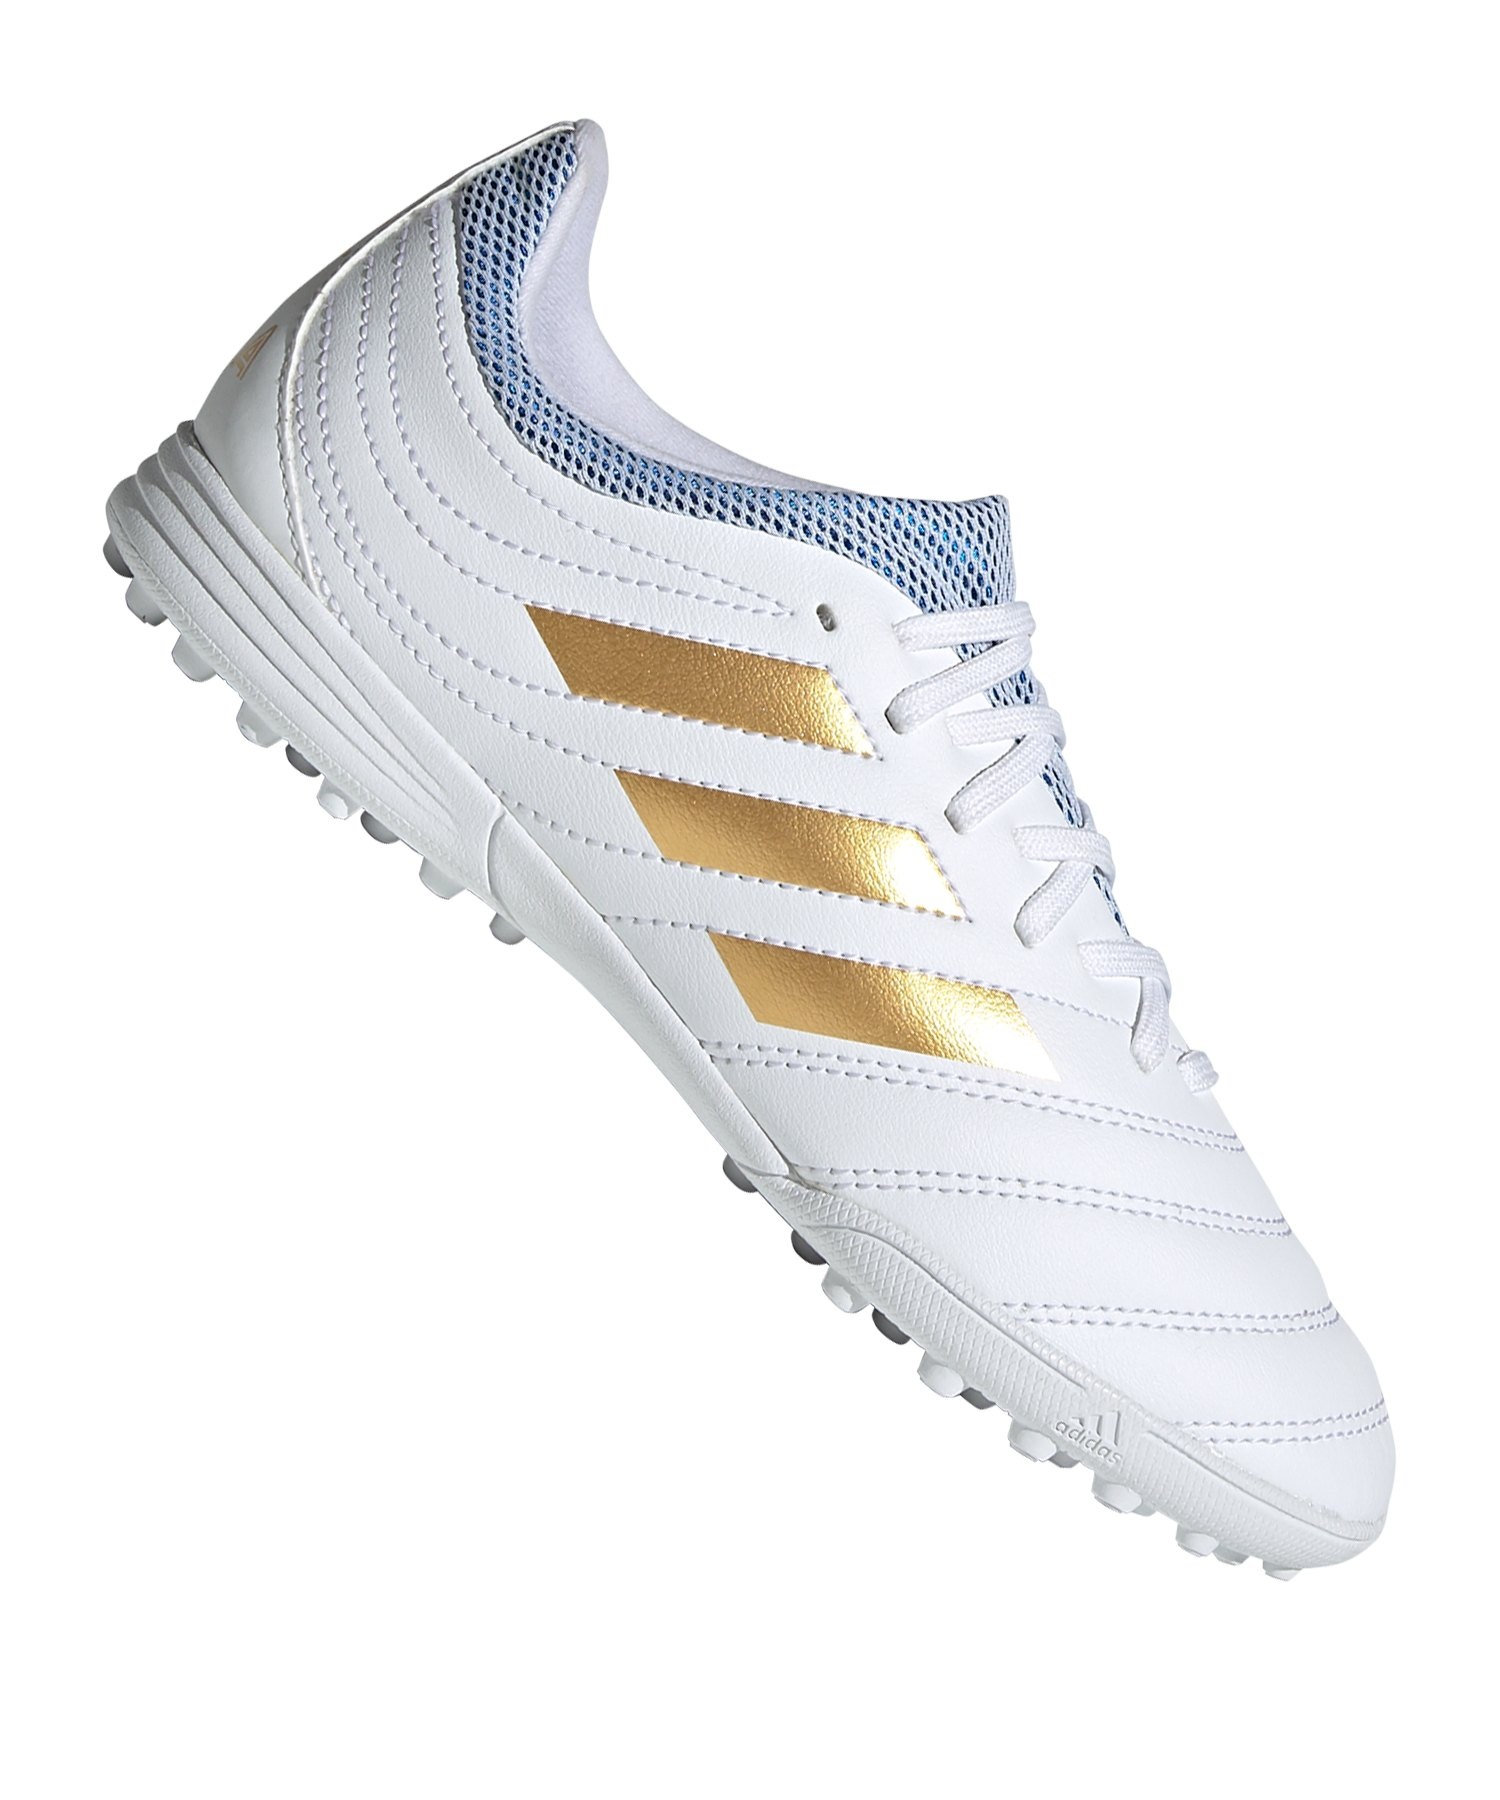 gold adidas weiß tennis schuhe weiß adidas gold schuhe adidas tennis N0vm8nw